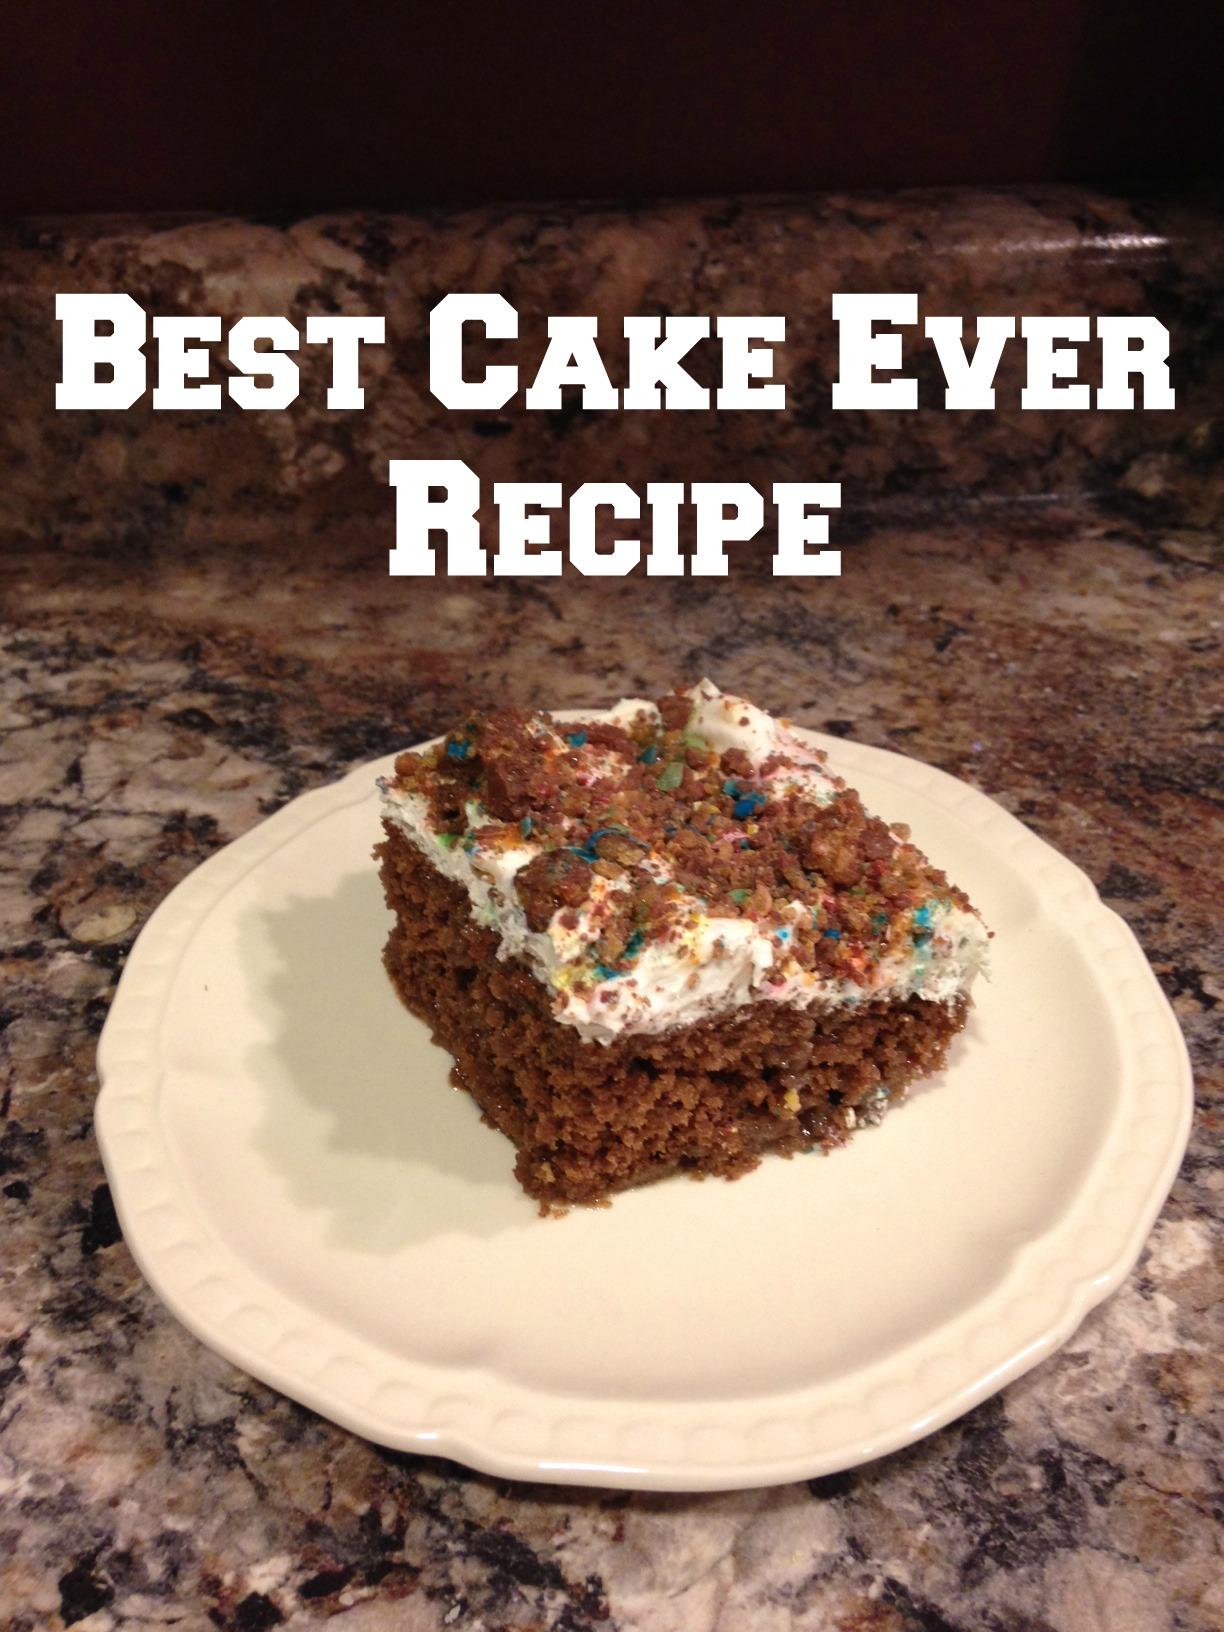 Best Cake Ever Recipe #MothersDayReddi #ShareTheJoy